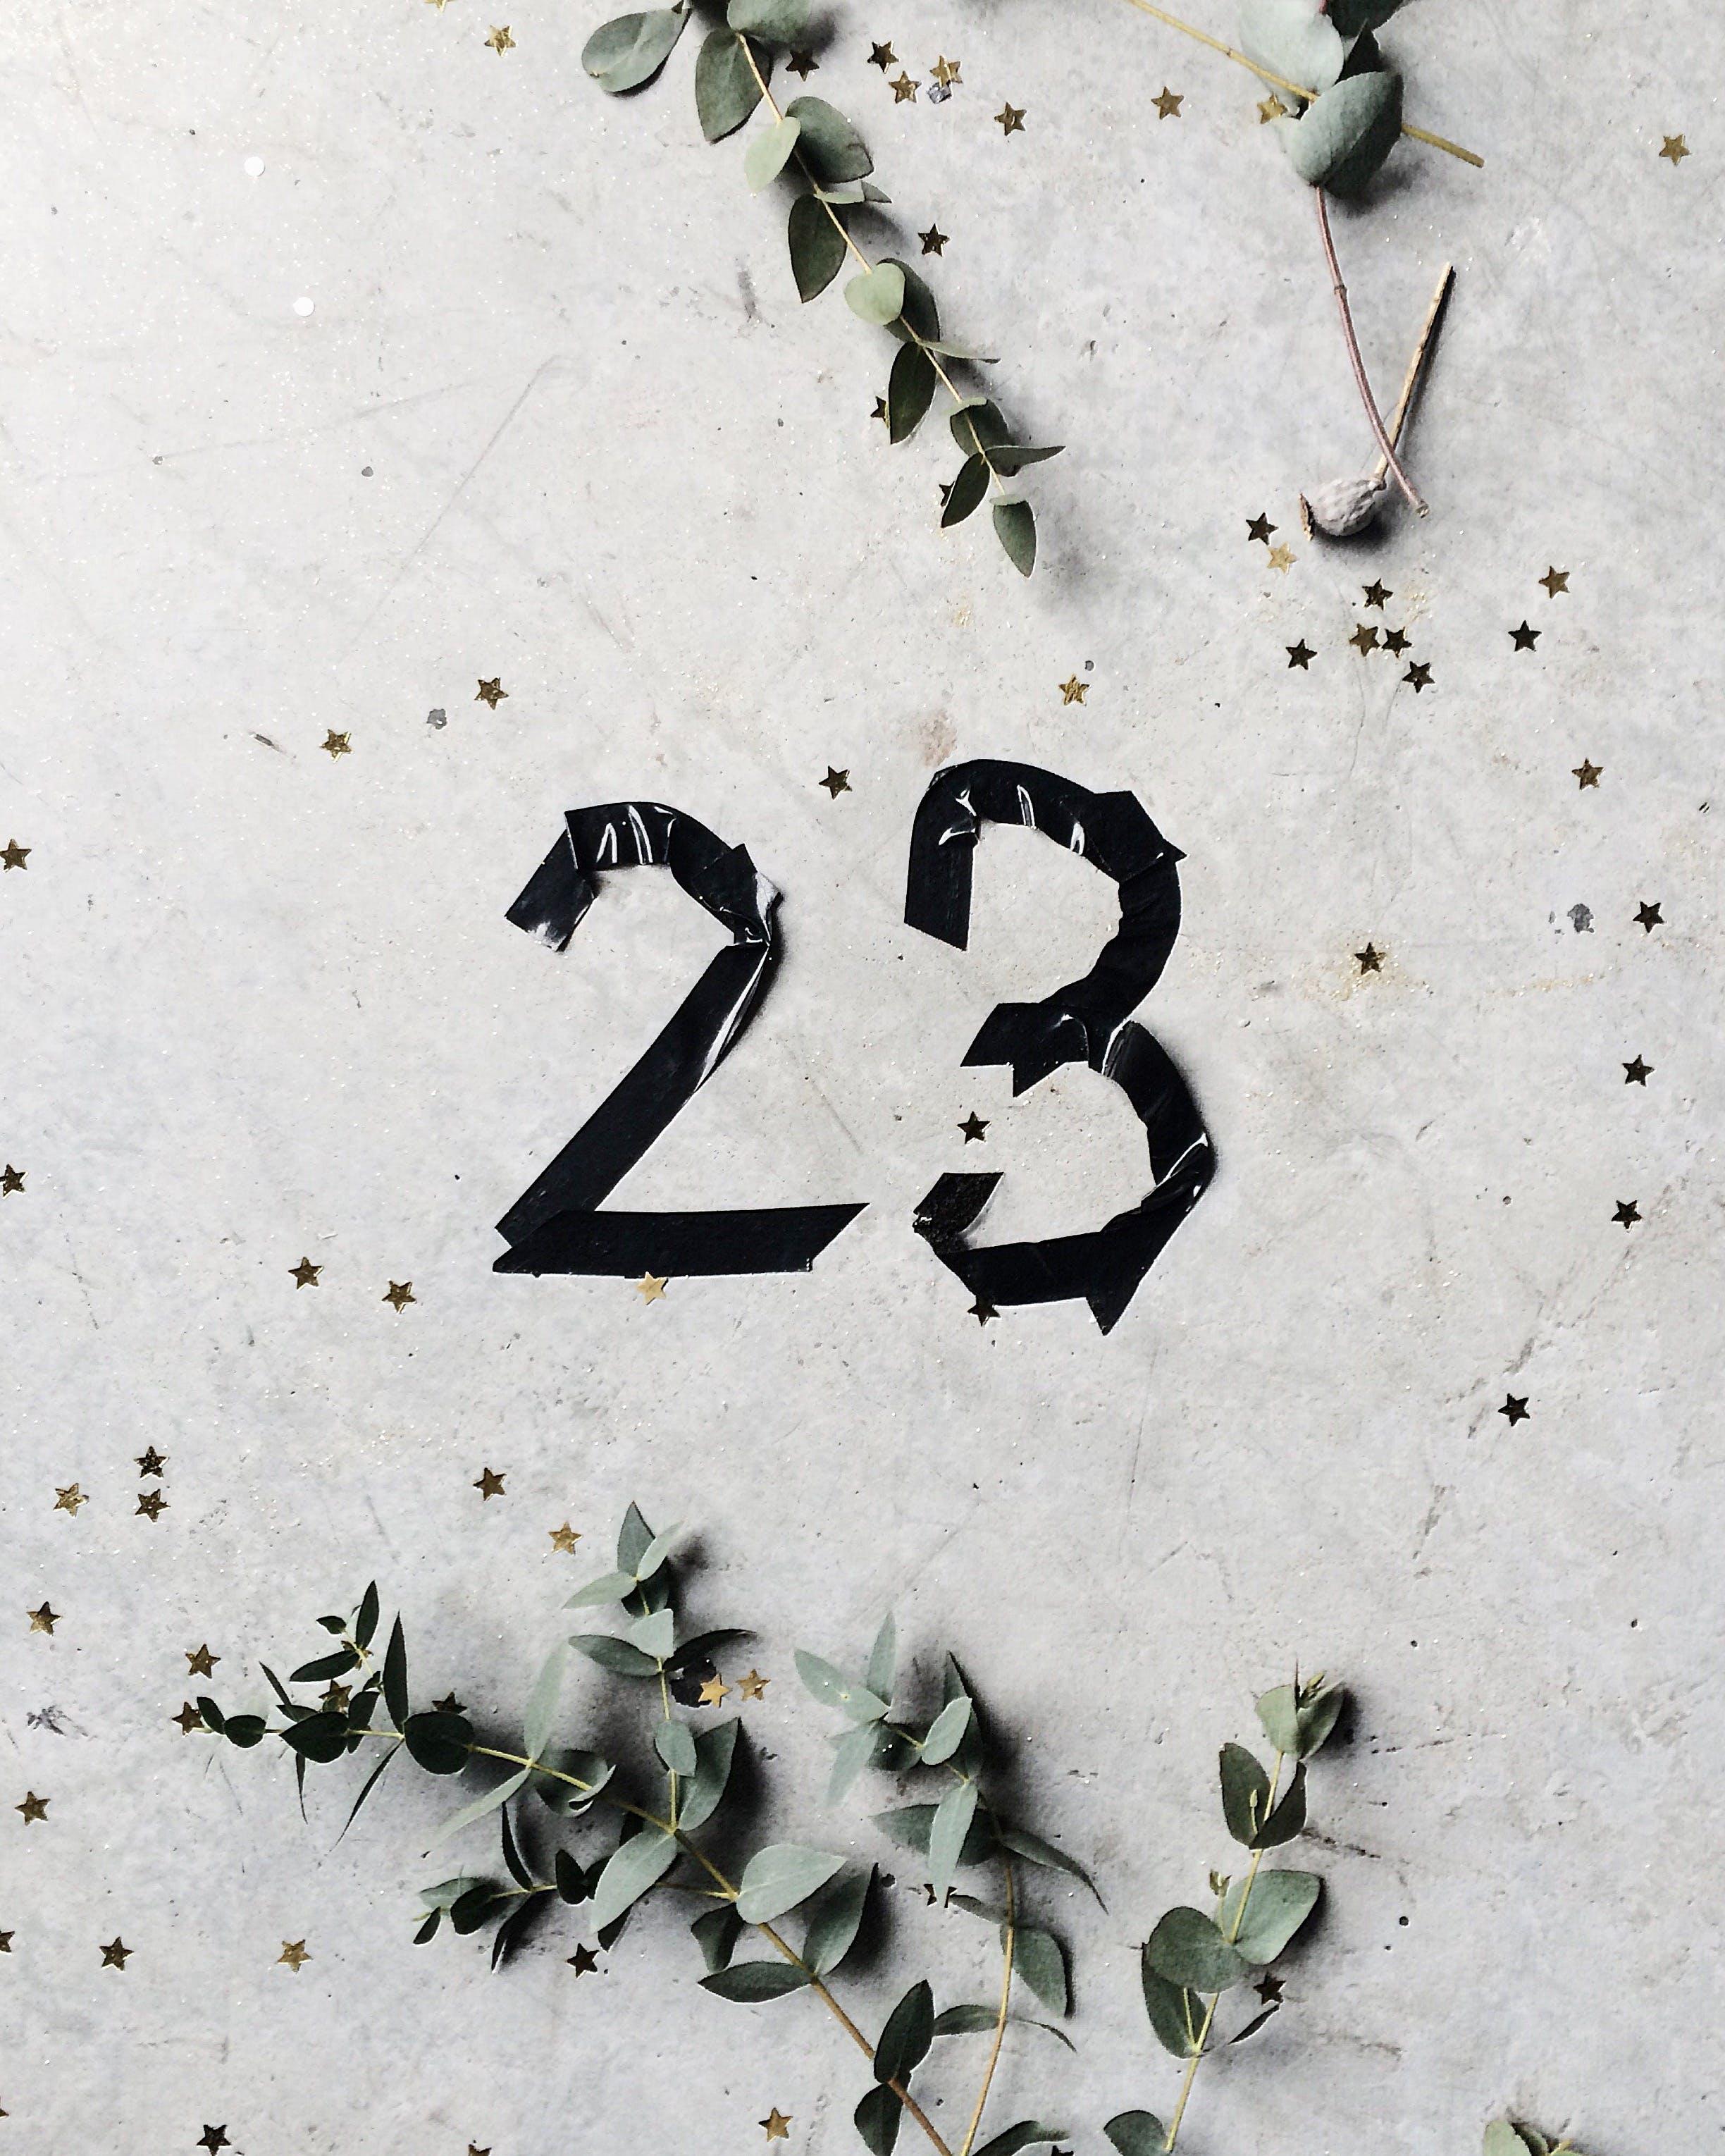 White Concrete Wall Showing 23 Sticker